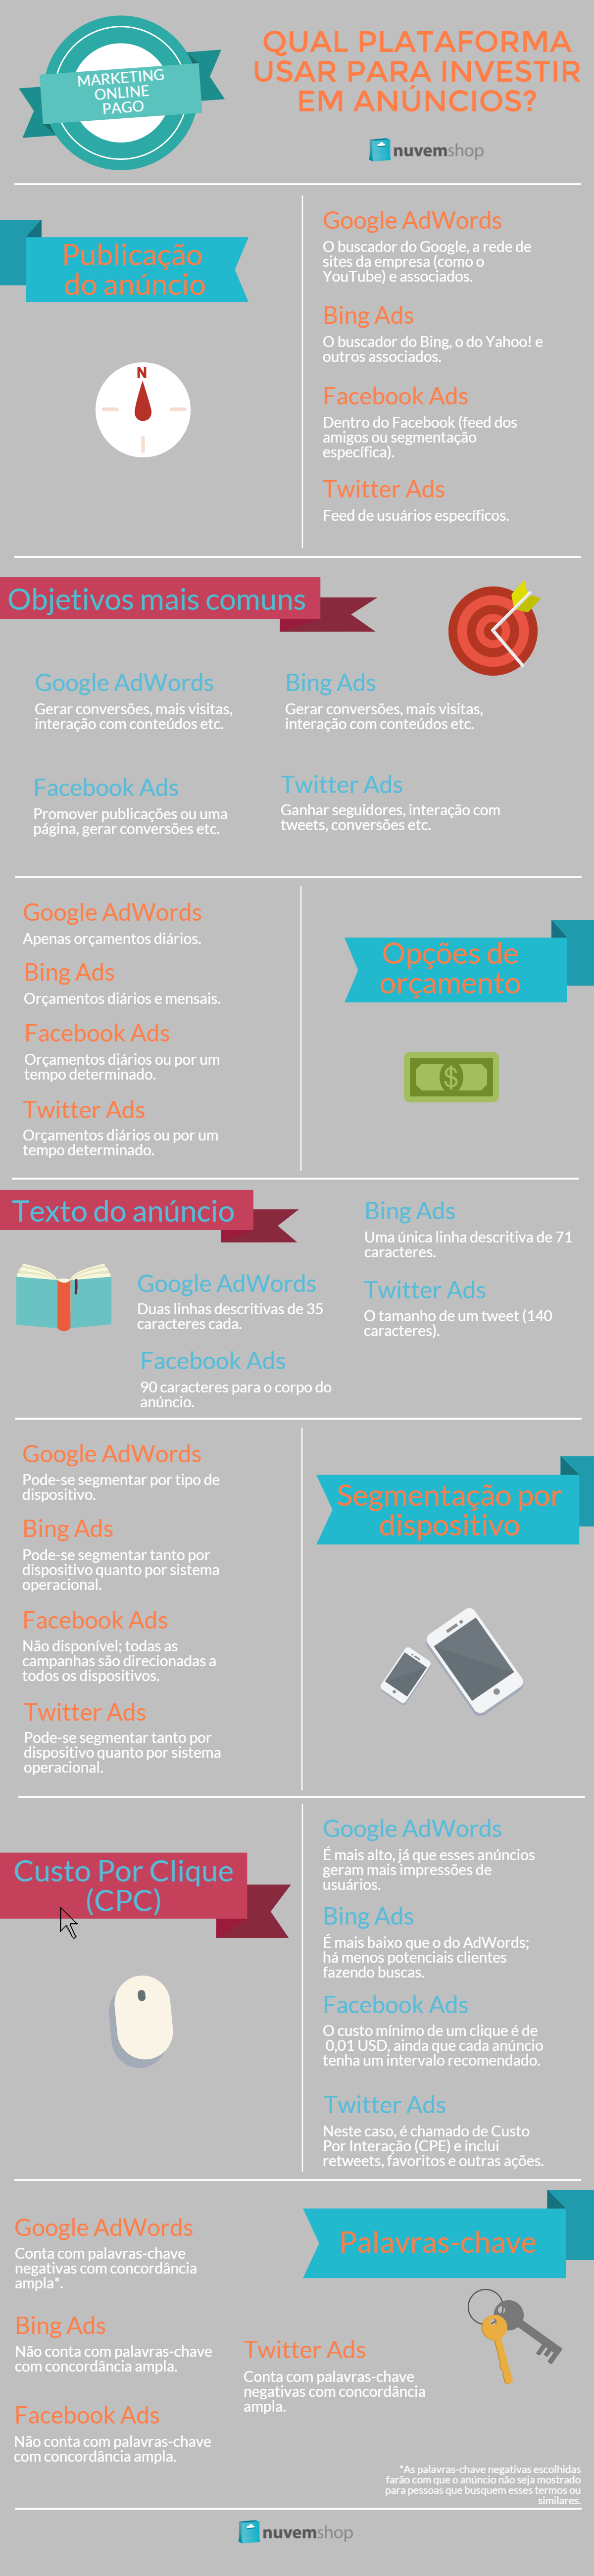 Infográfico sobre Google Ads, Facebook Ads, Bing Ads e Twitter Ads